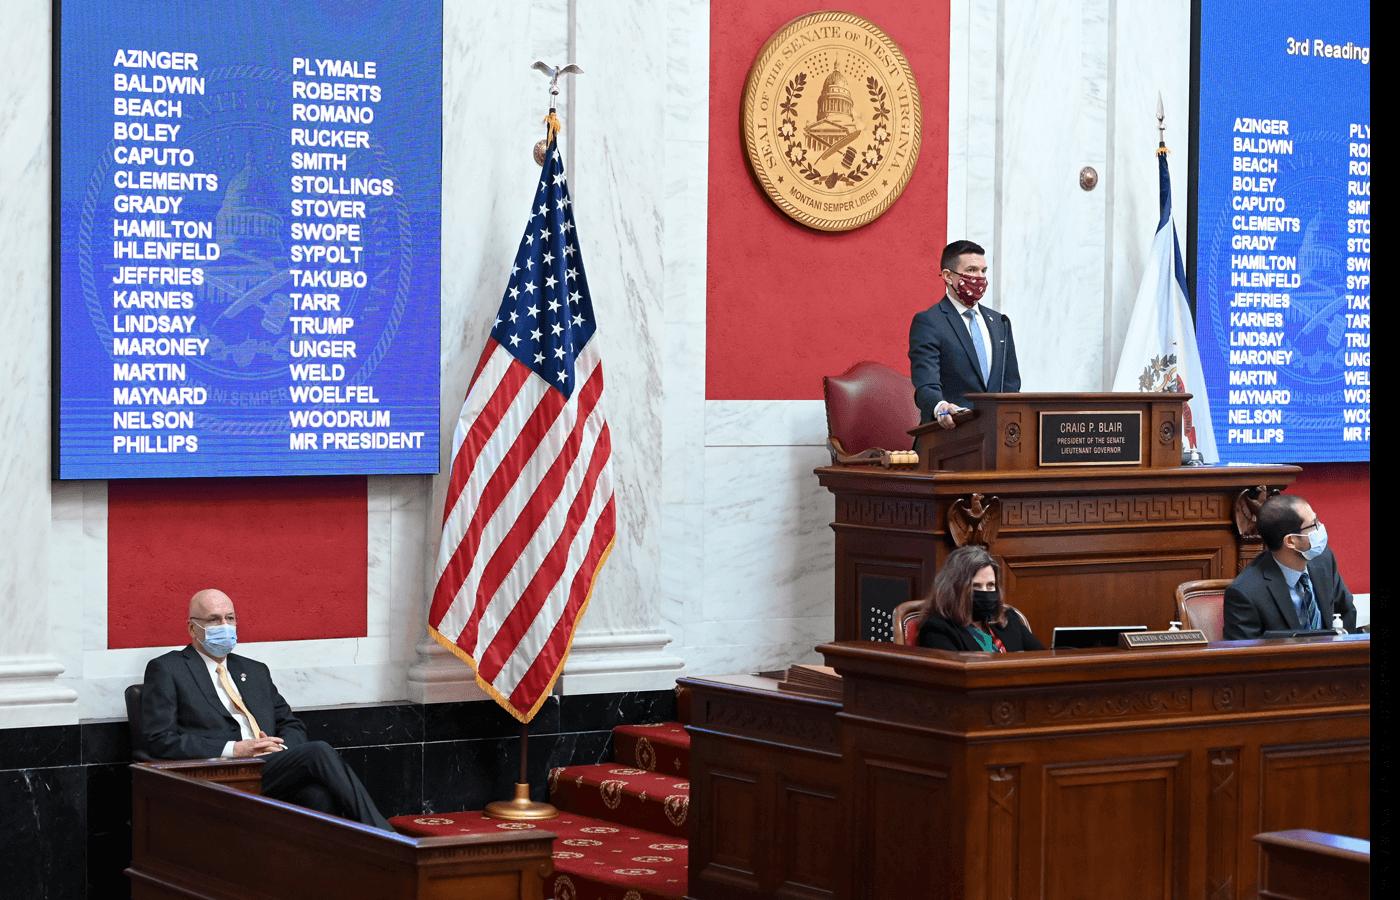 The West Virginia state Senate debates school choice legislation, March 17, 2021.